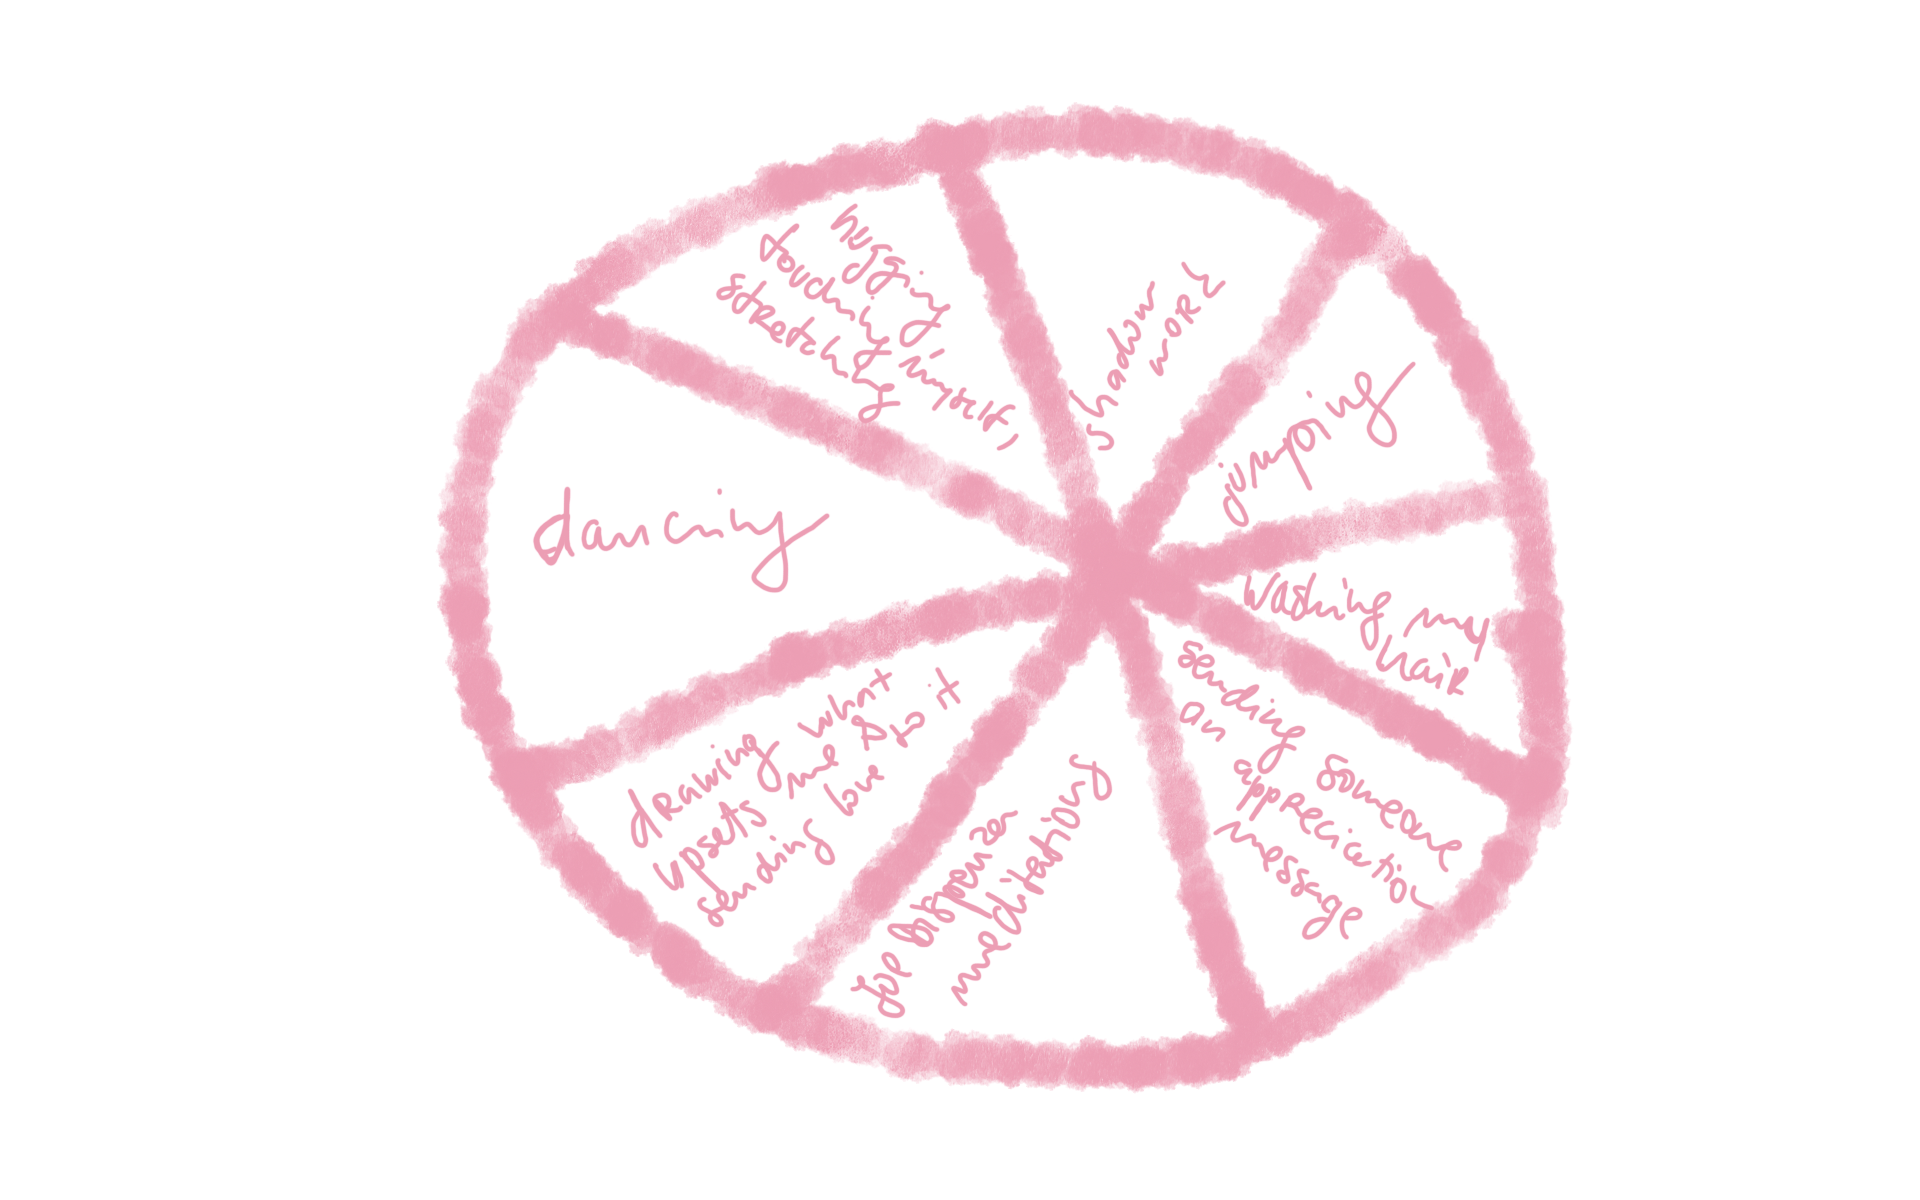 self love pie chart